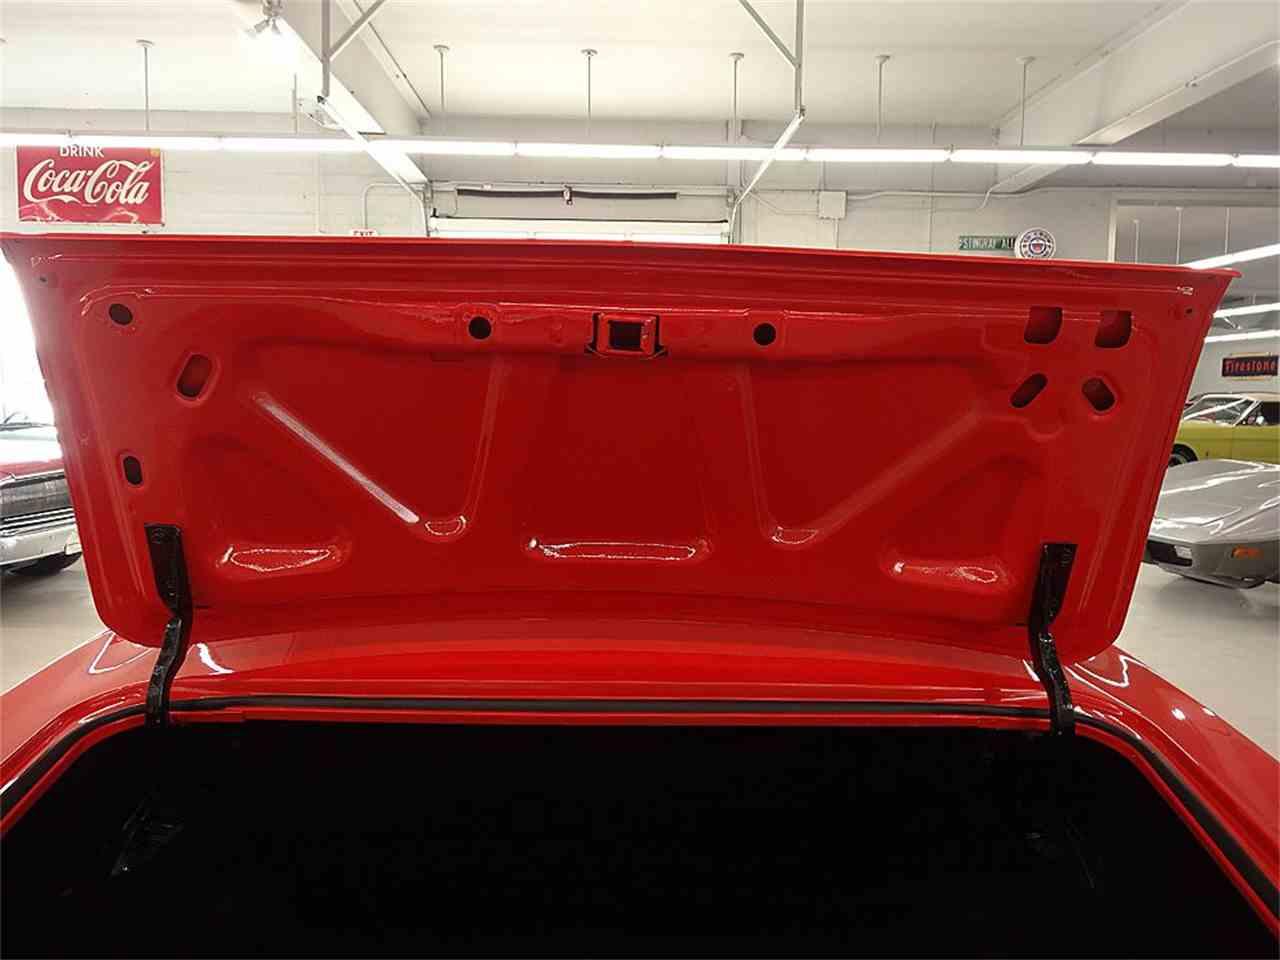 Large Picture of '69 Pontiac Firebird located in Iowa - $59,900.00 - LYHC